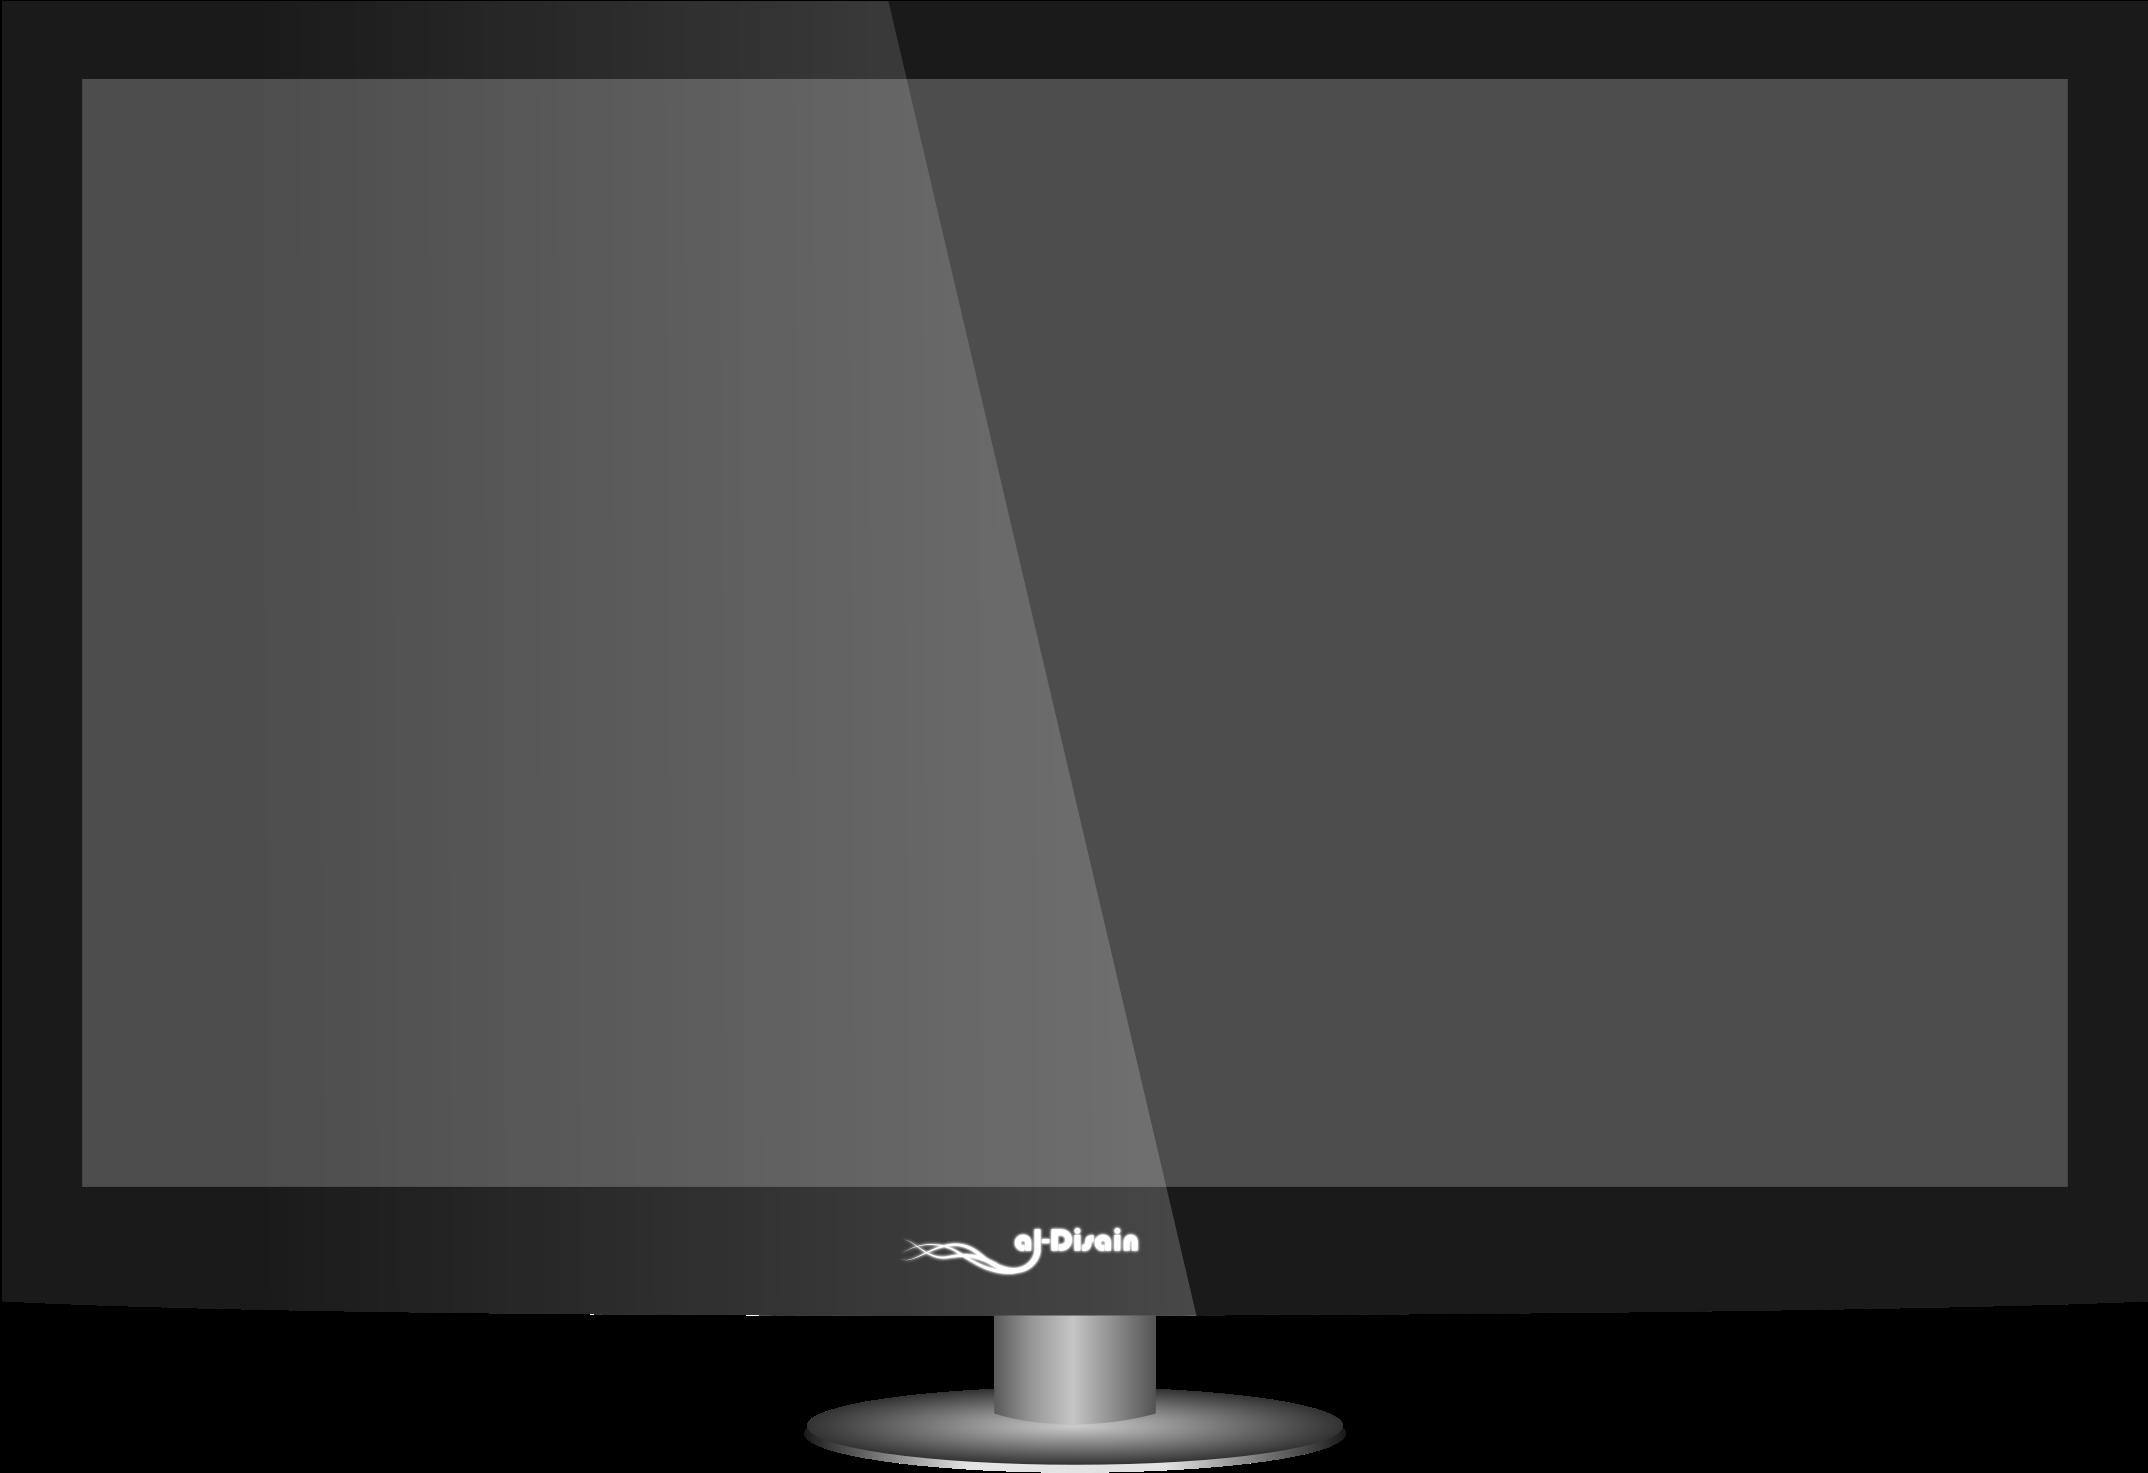 Smart tv icon clipart picture black and white download Download Clipart - Smart Tv Icon Png PNG Image with No ... picture black and white download